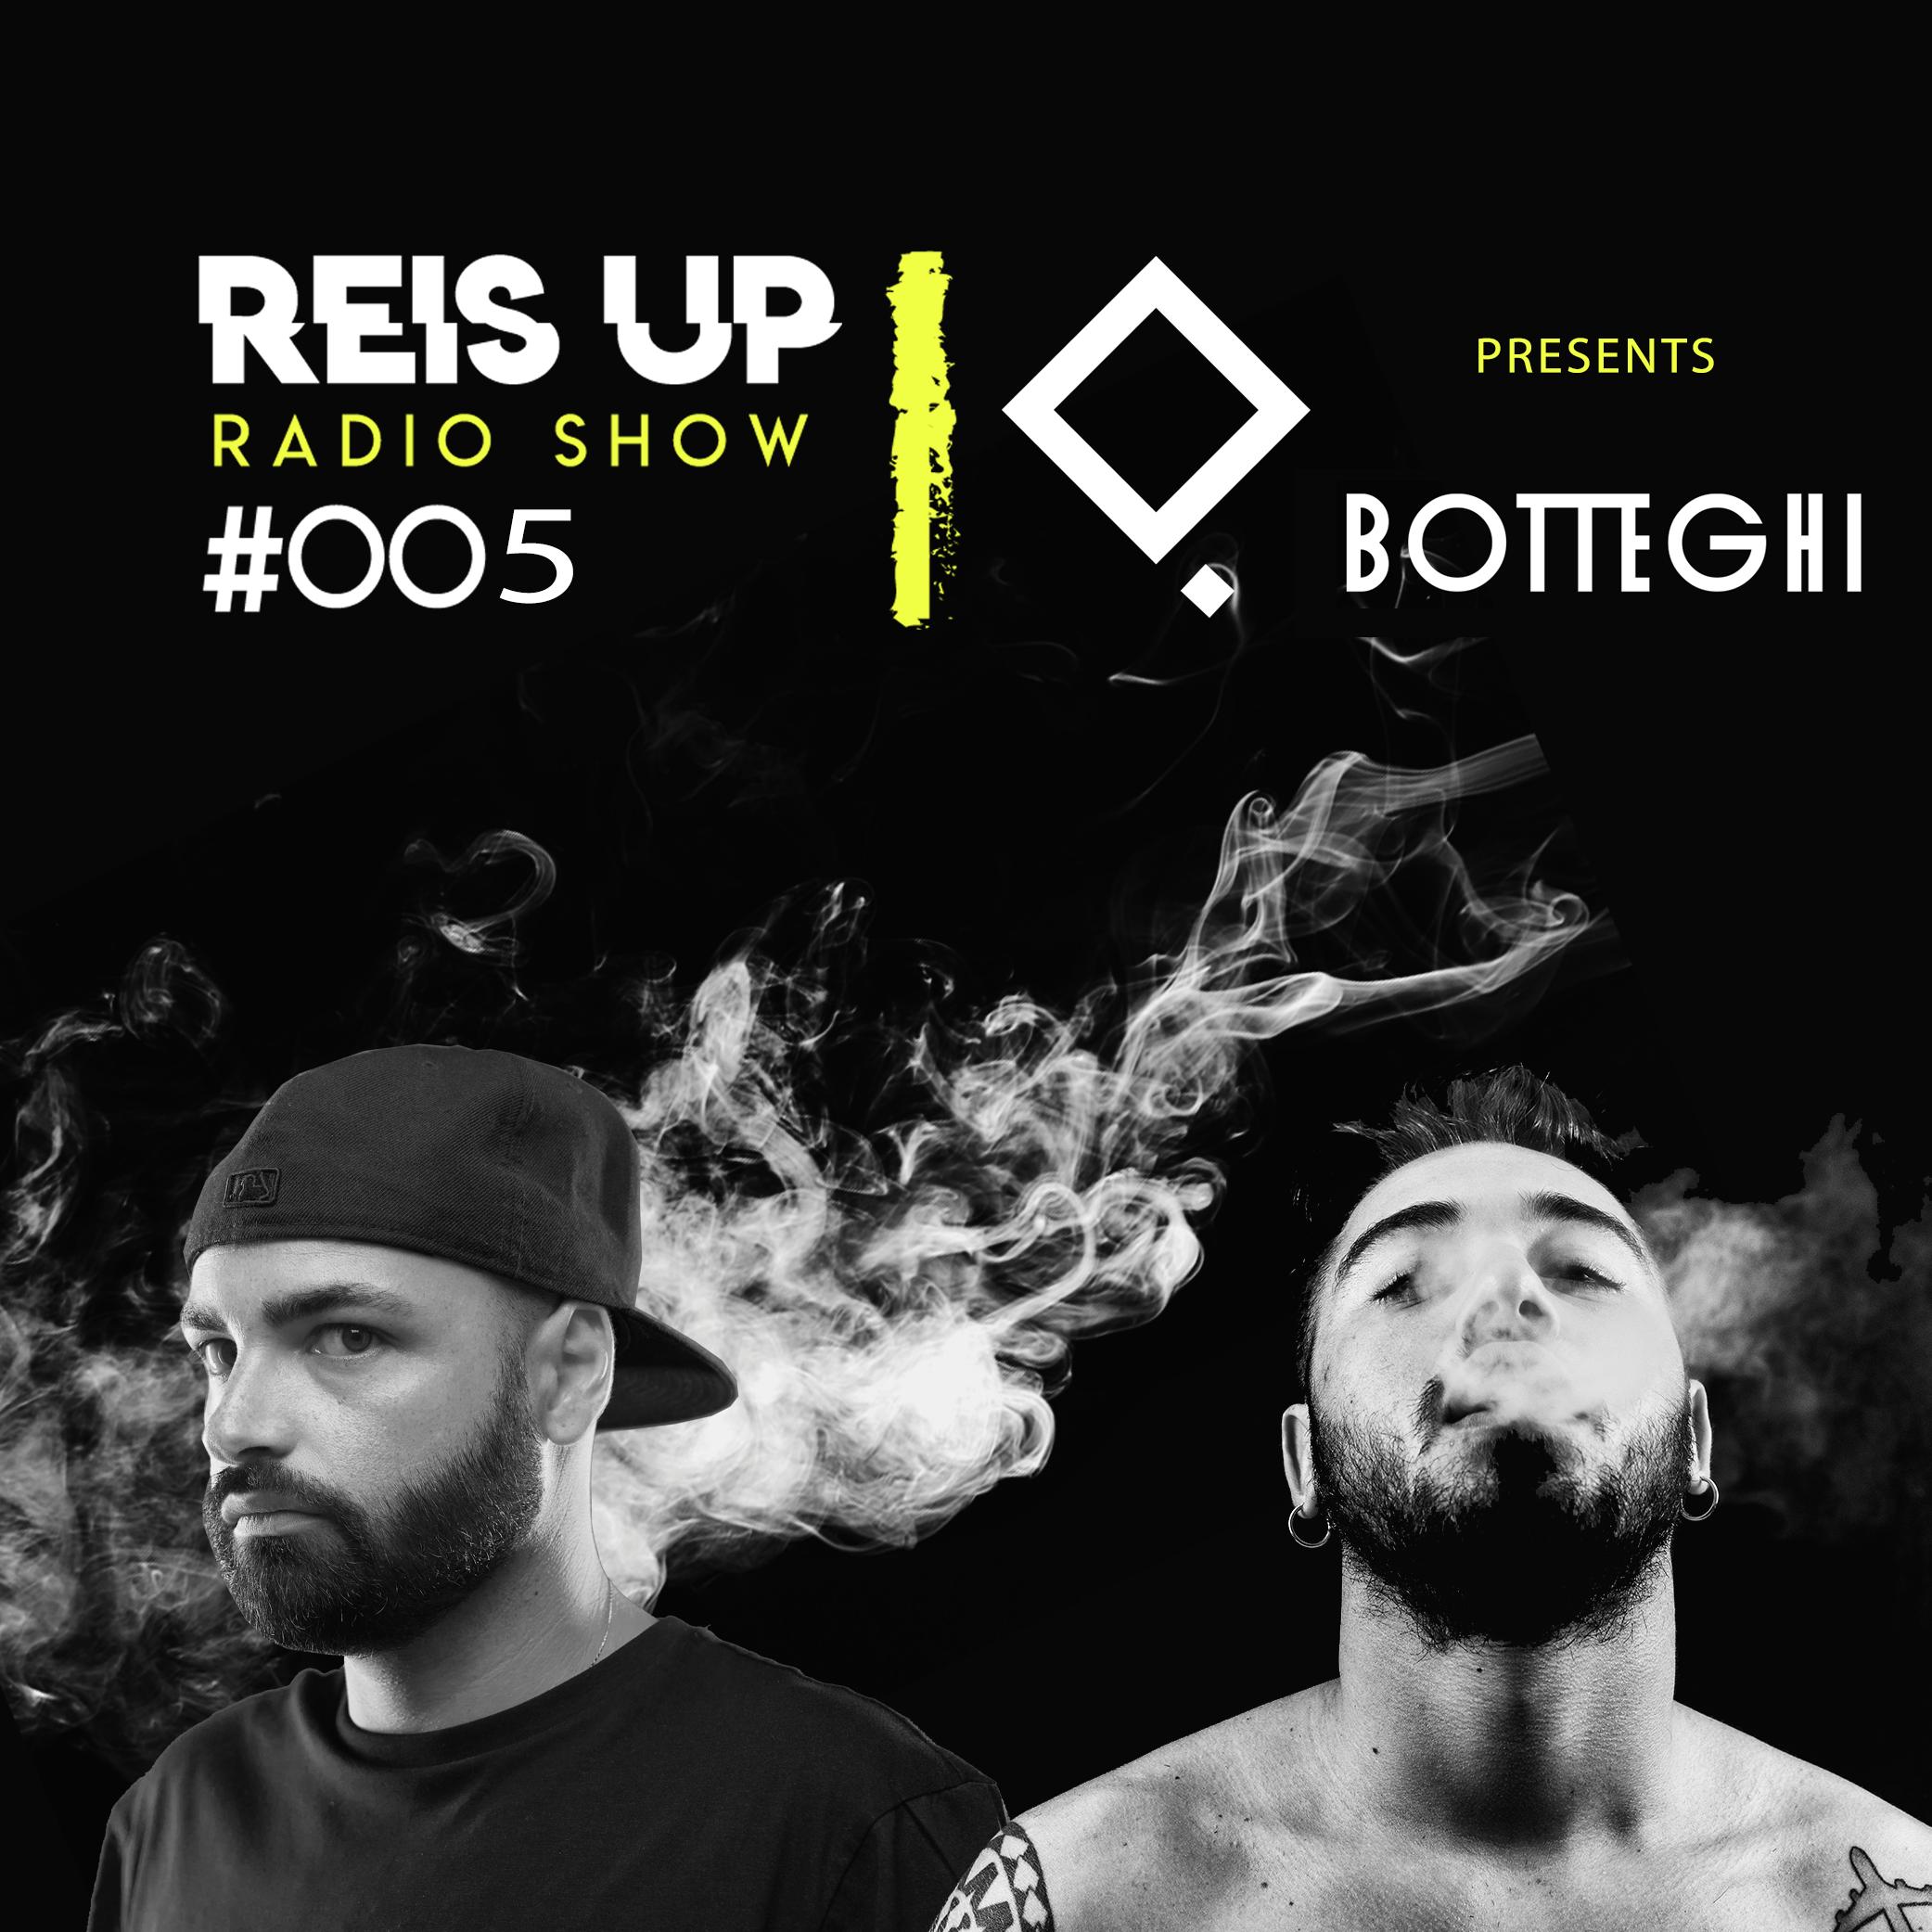 Stefano-Reis-Reis-Up-Radio-Show-005-Guest-BOTTEGHI